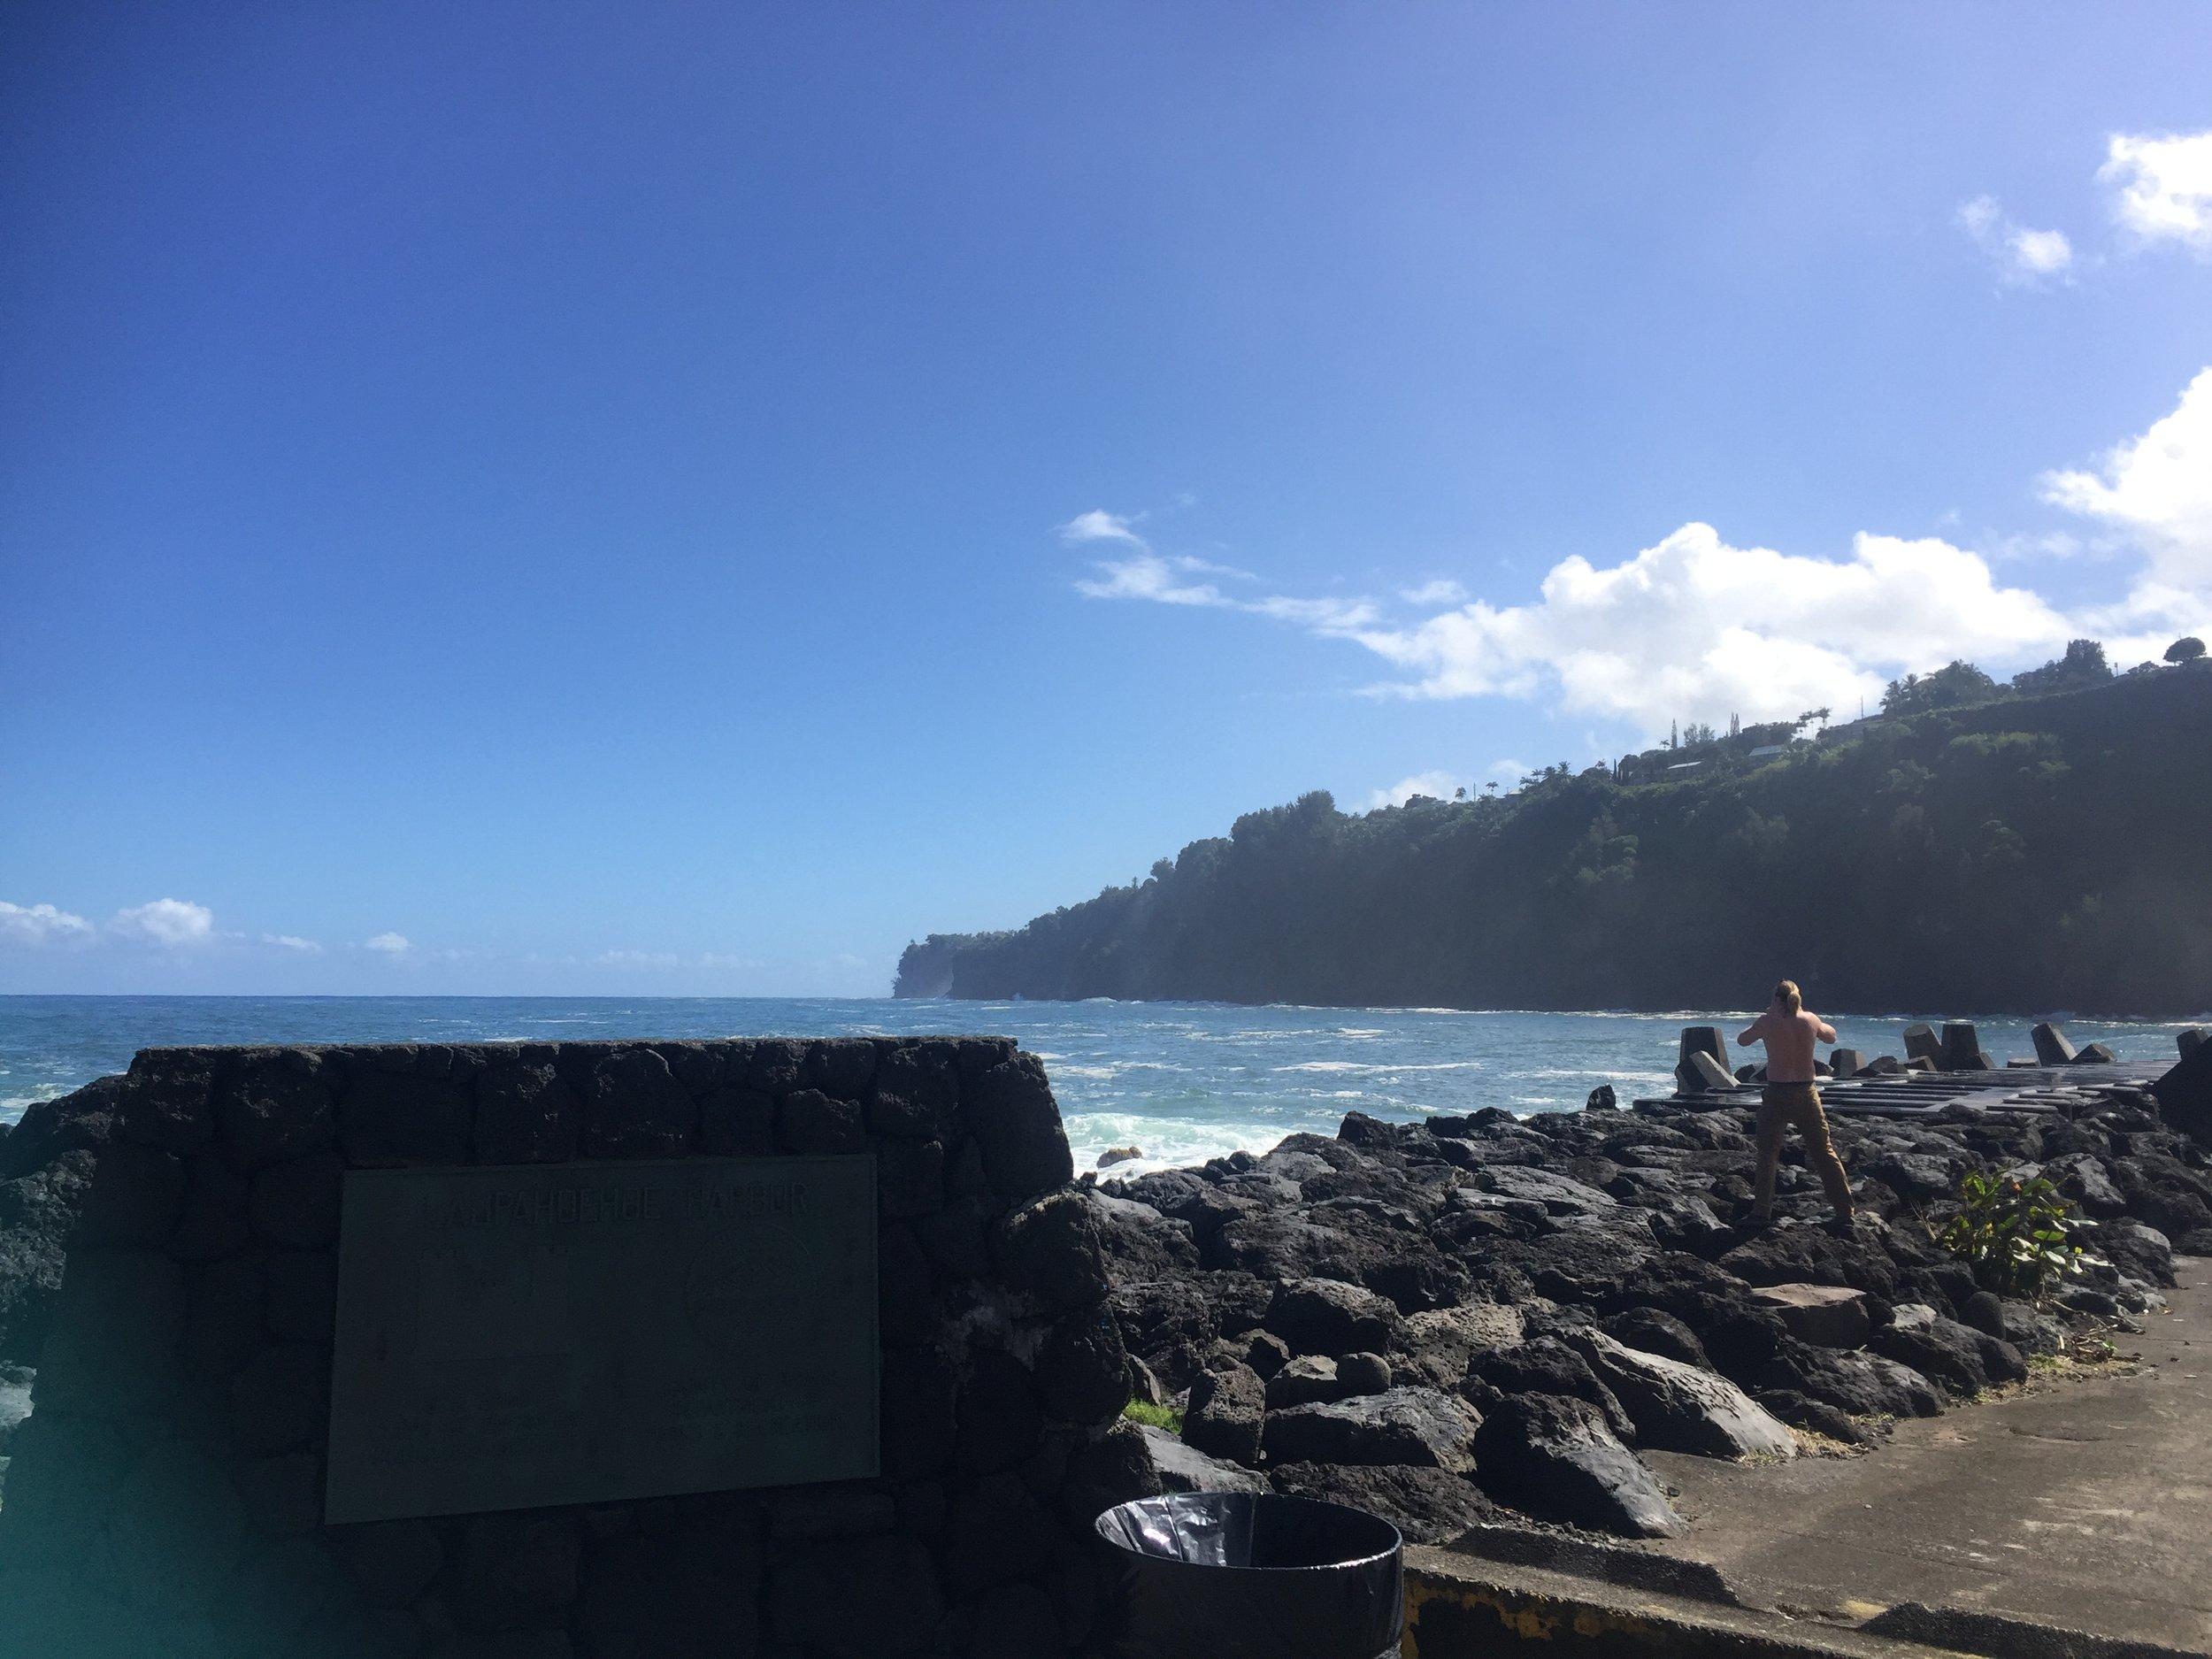 TOP TEN HAWAI'I ISLAND STOPS - I SEND MY OHANA. WWW.HAWAIISIMPLYNATURALRESTAURANT.COM